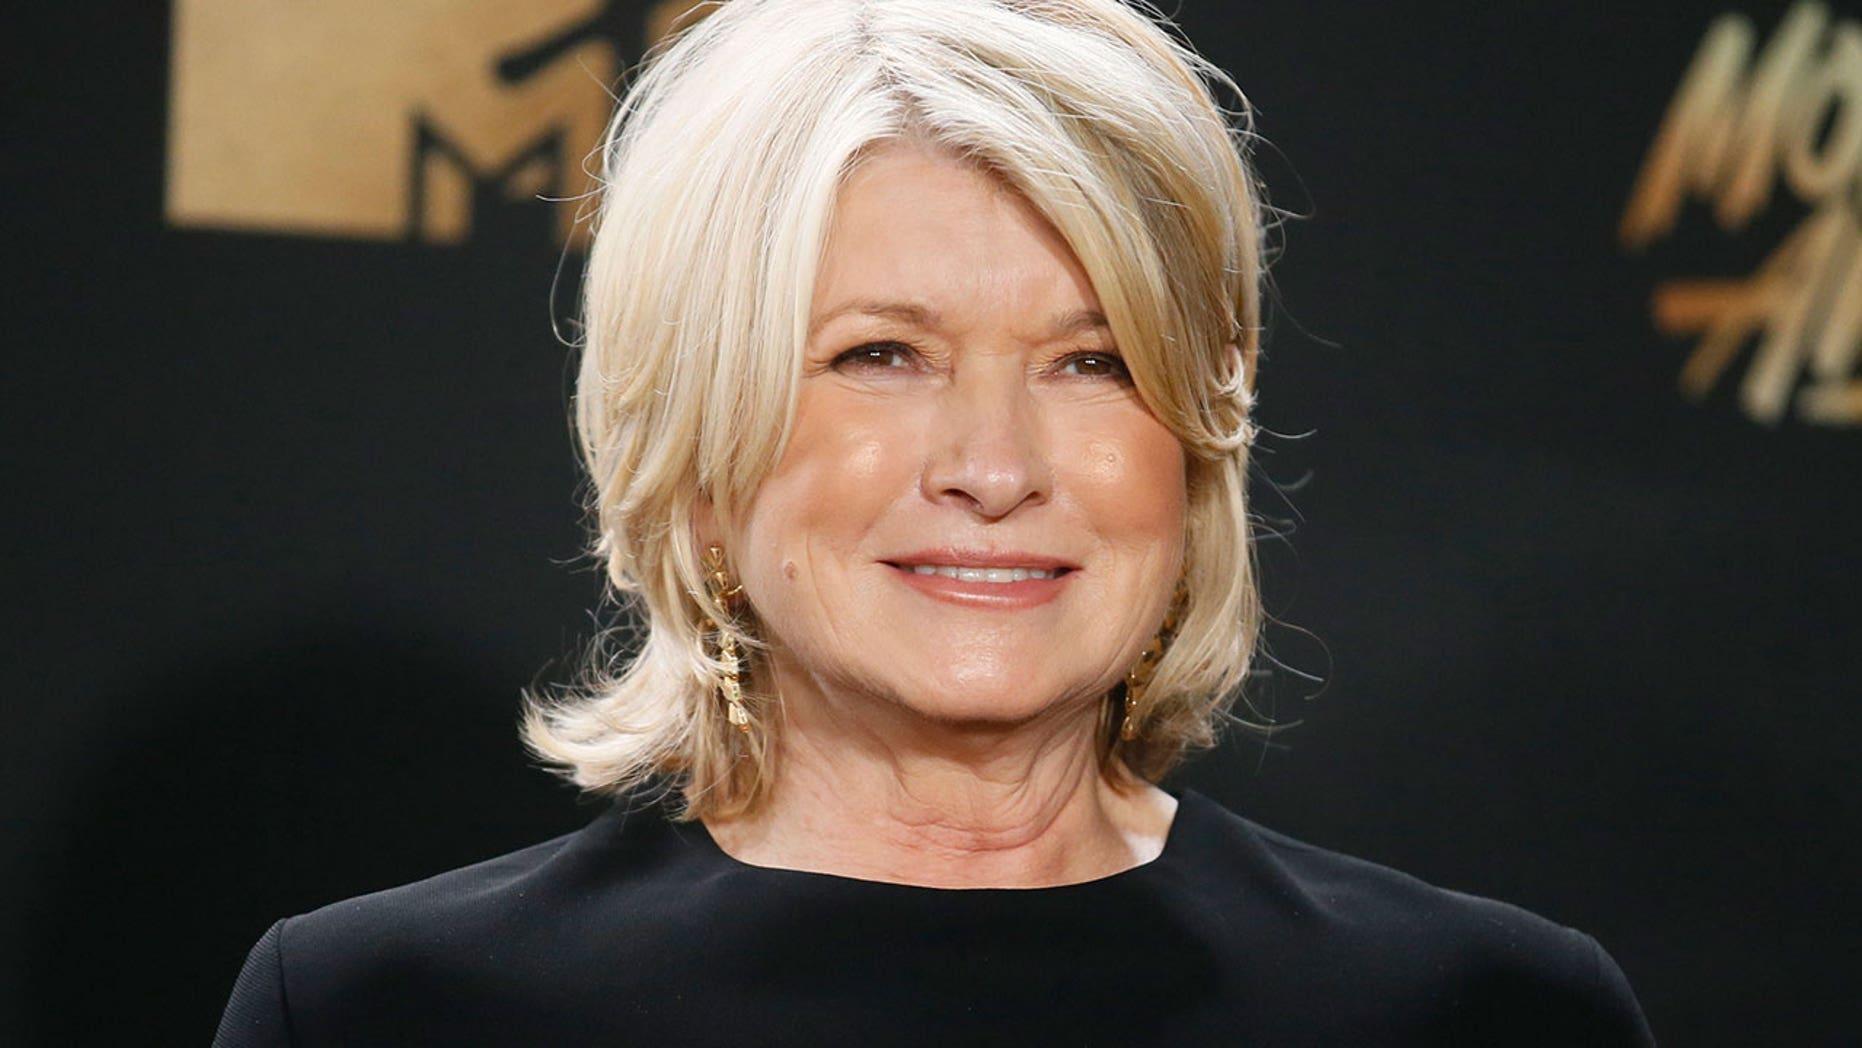 Martha Stewart shares her guilty pleasure foods